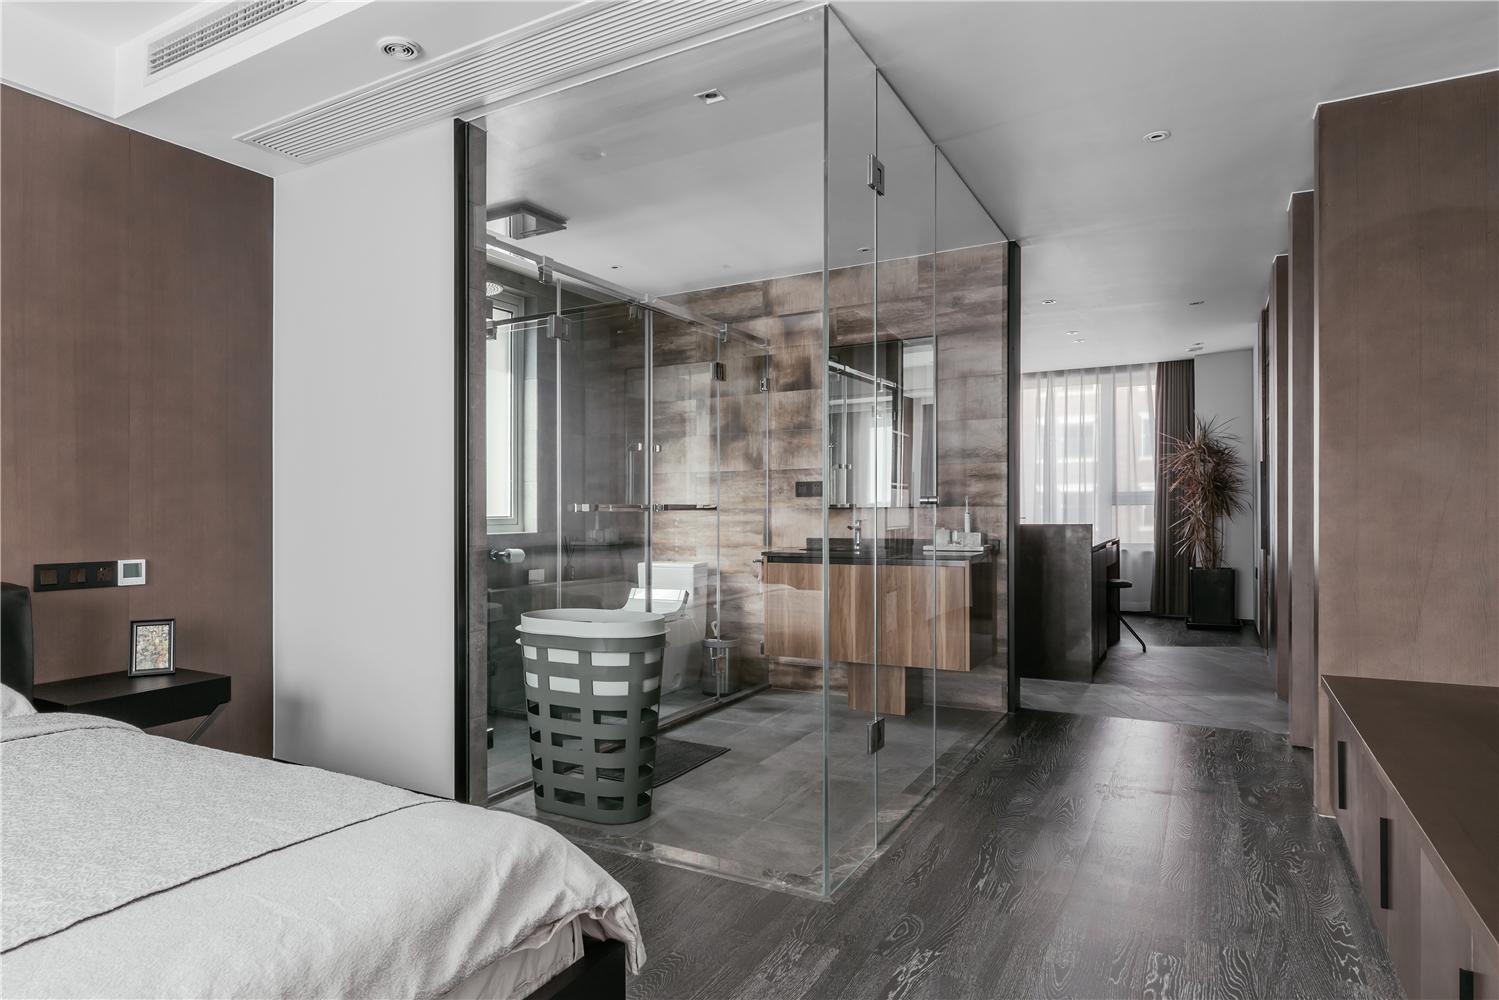 140m²现代风格卧室卫生间装修效果图